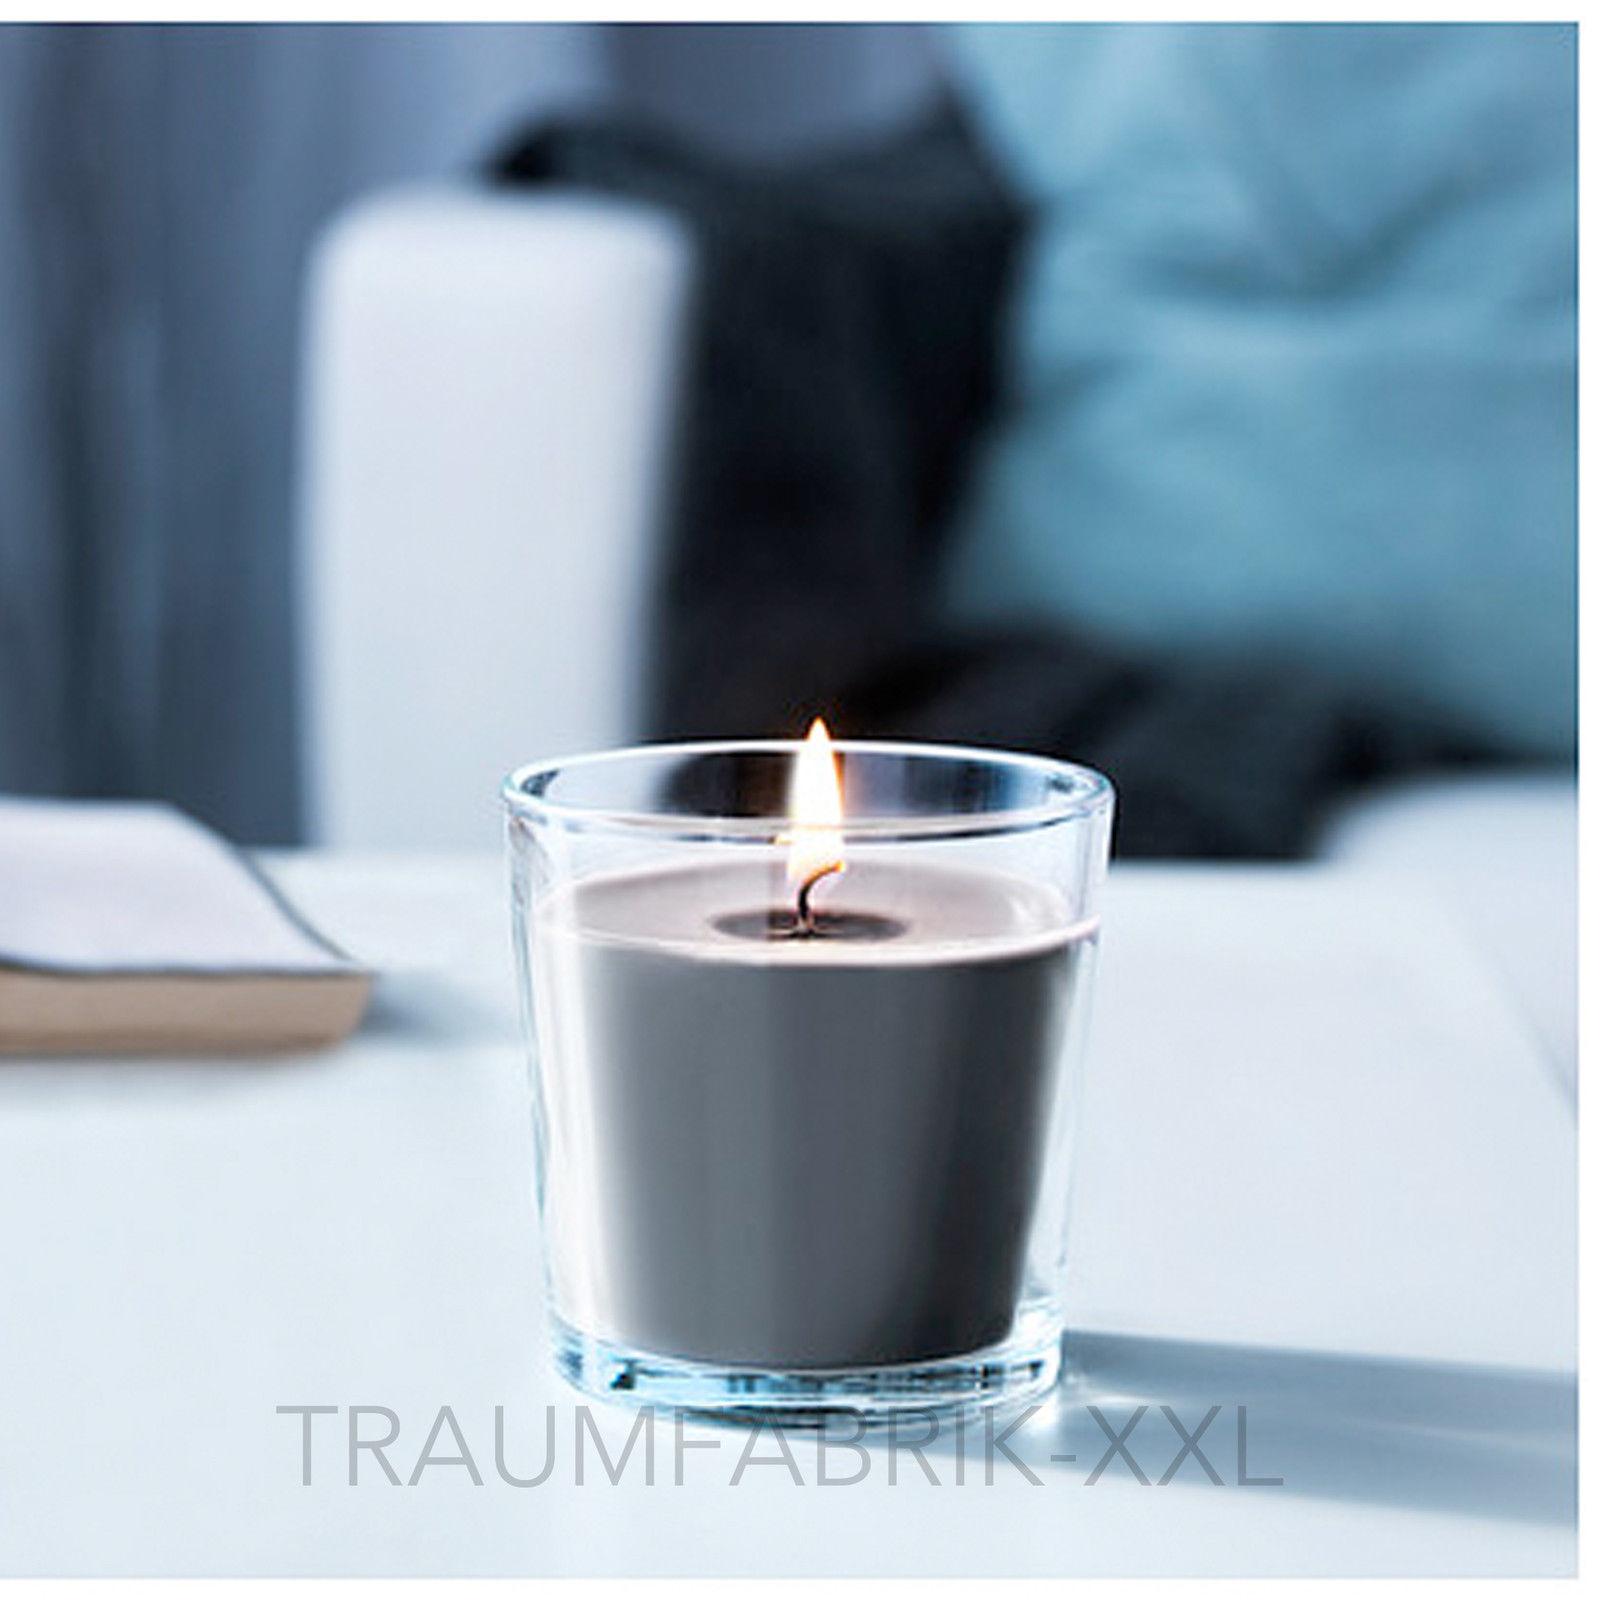 10 x duftkerze kerze im glas 7 5 cm teelicht 25 std brenndauer kerzen grau neu traumfabrik xxl. Black Bedroom Furniture Sets. Home Design Ideas